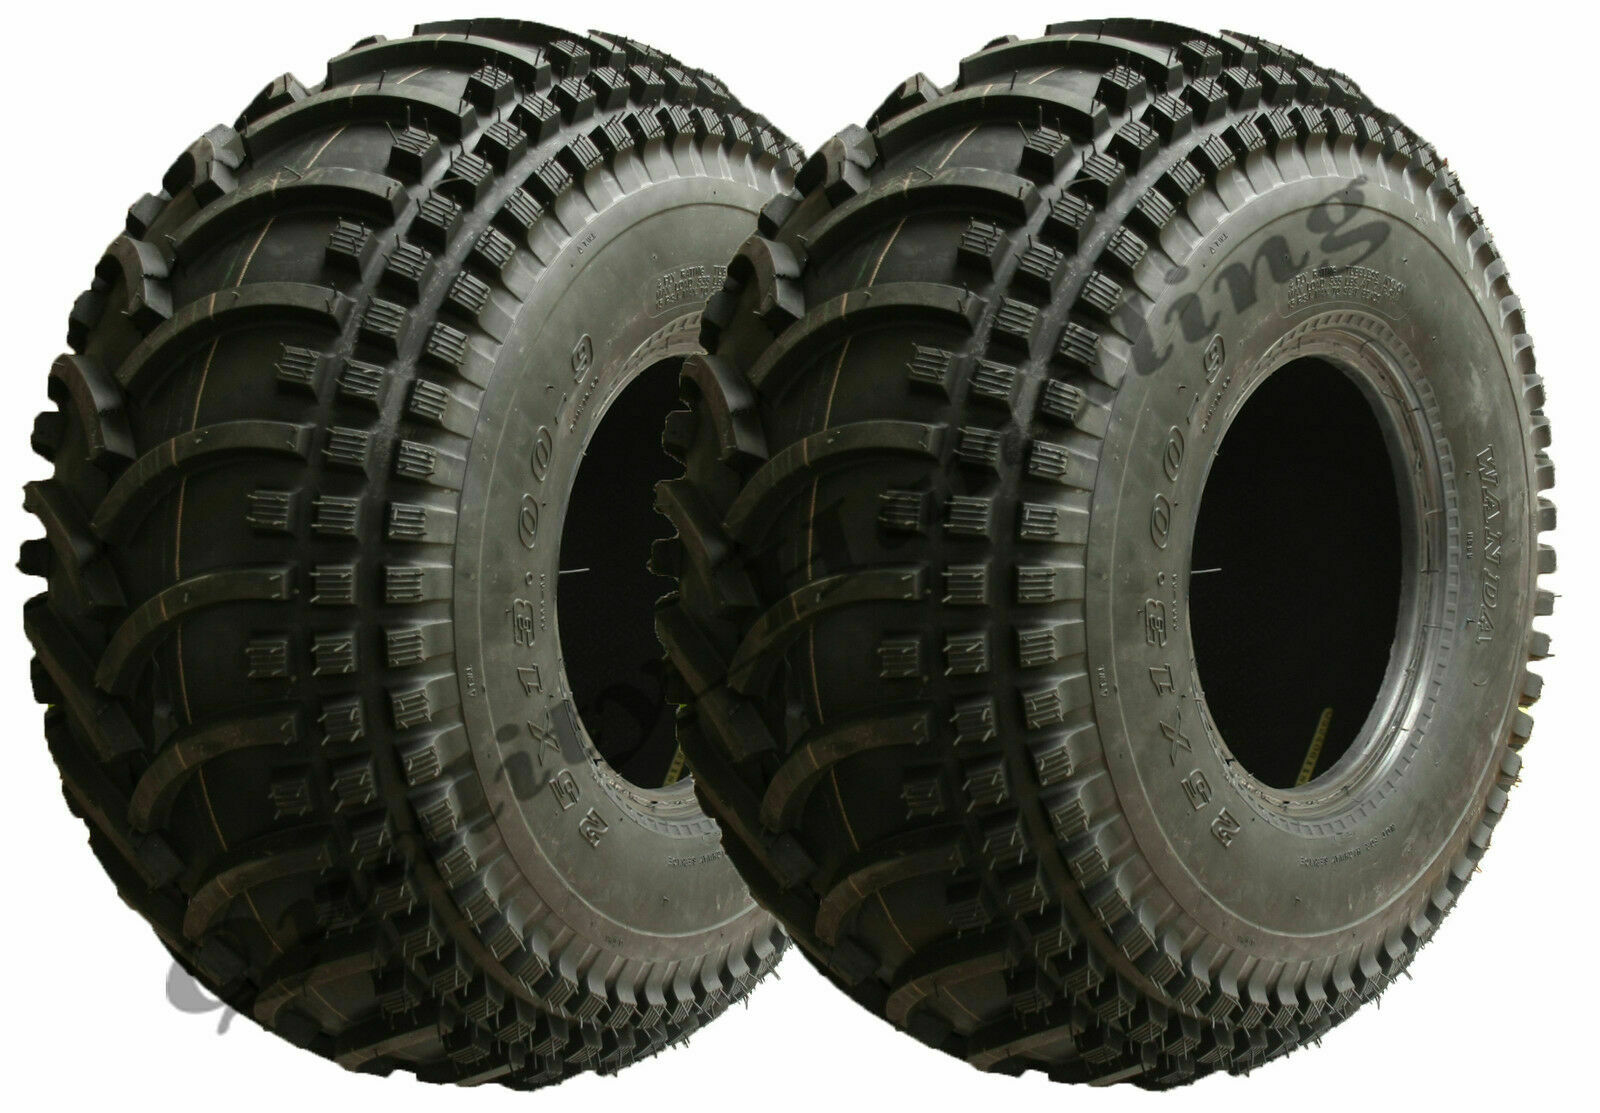 2 - 25x13.00-9 Quad Reifen 25 13 9 Atv Reifen (25 12 9)